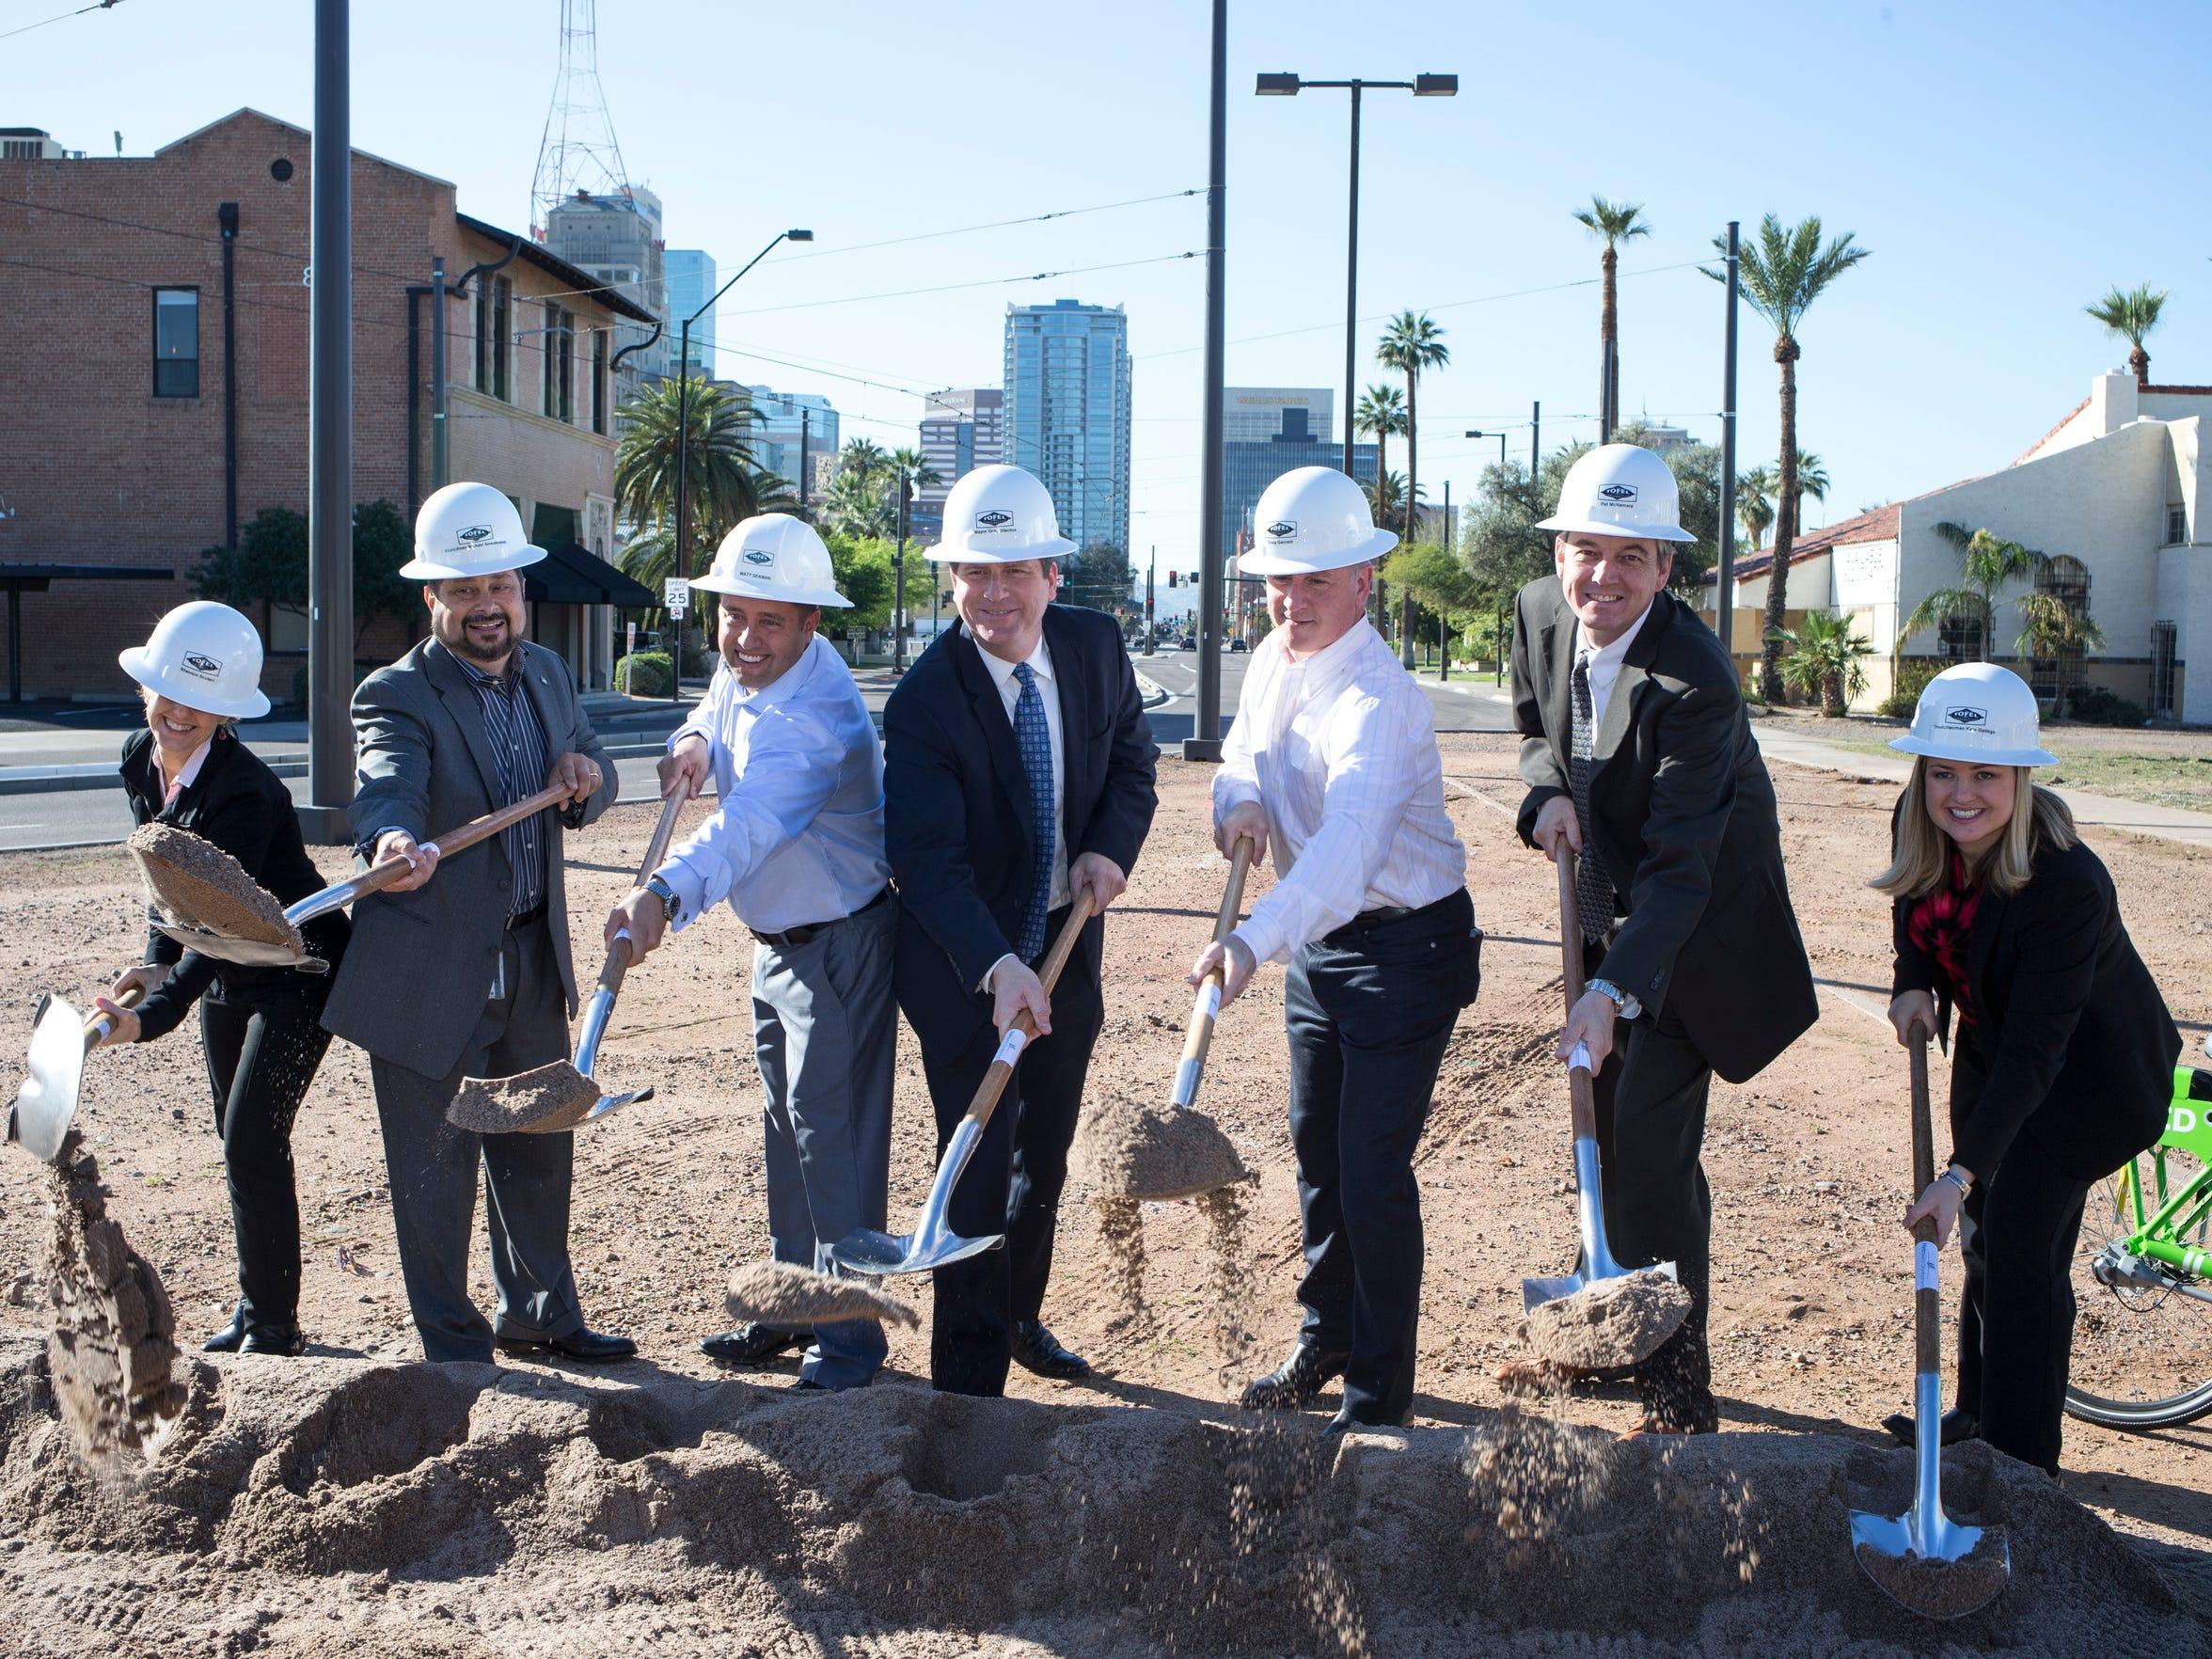 Phoenix leaders, including Mayor Greg Stanton, break